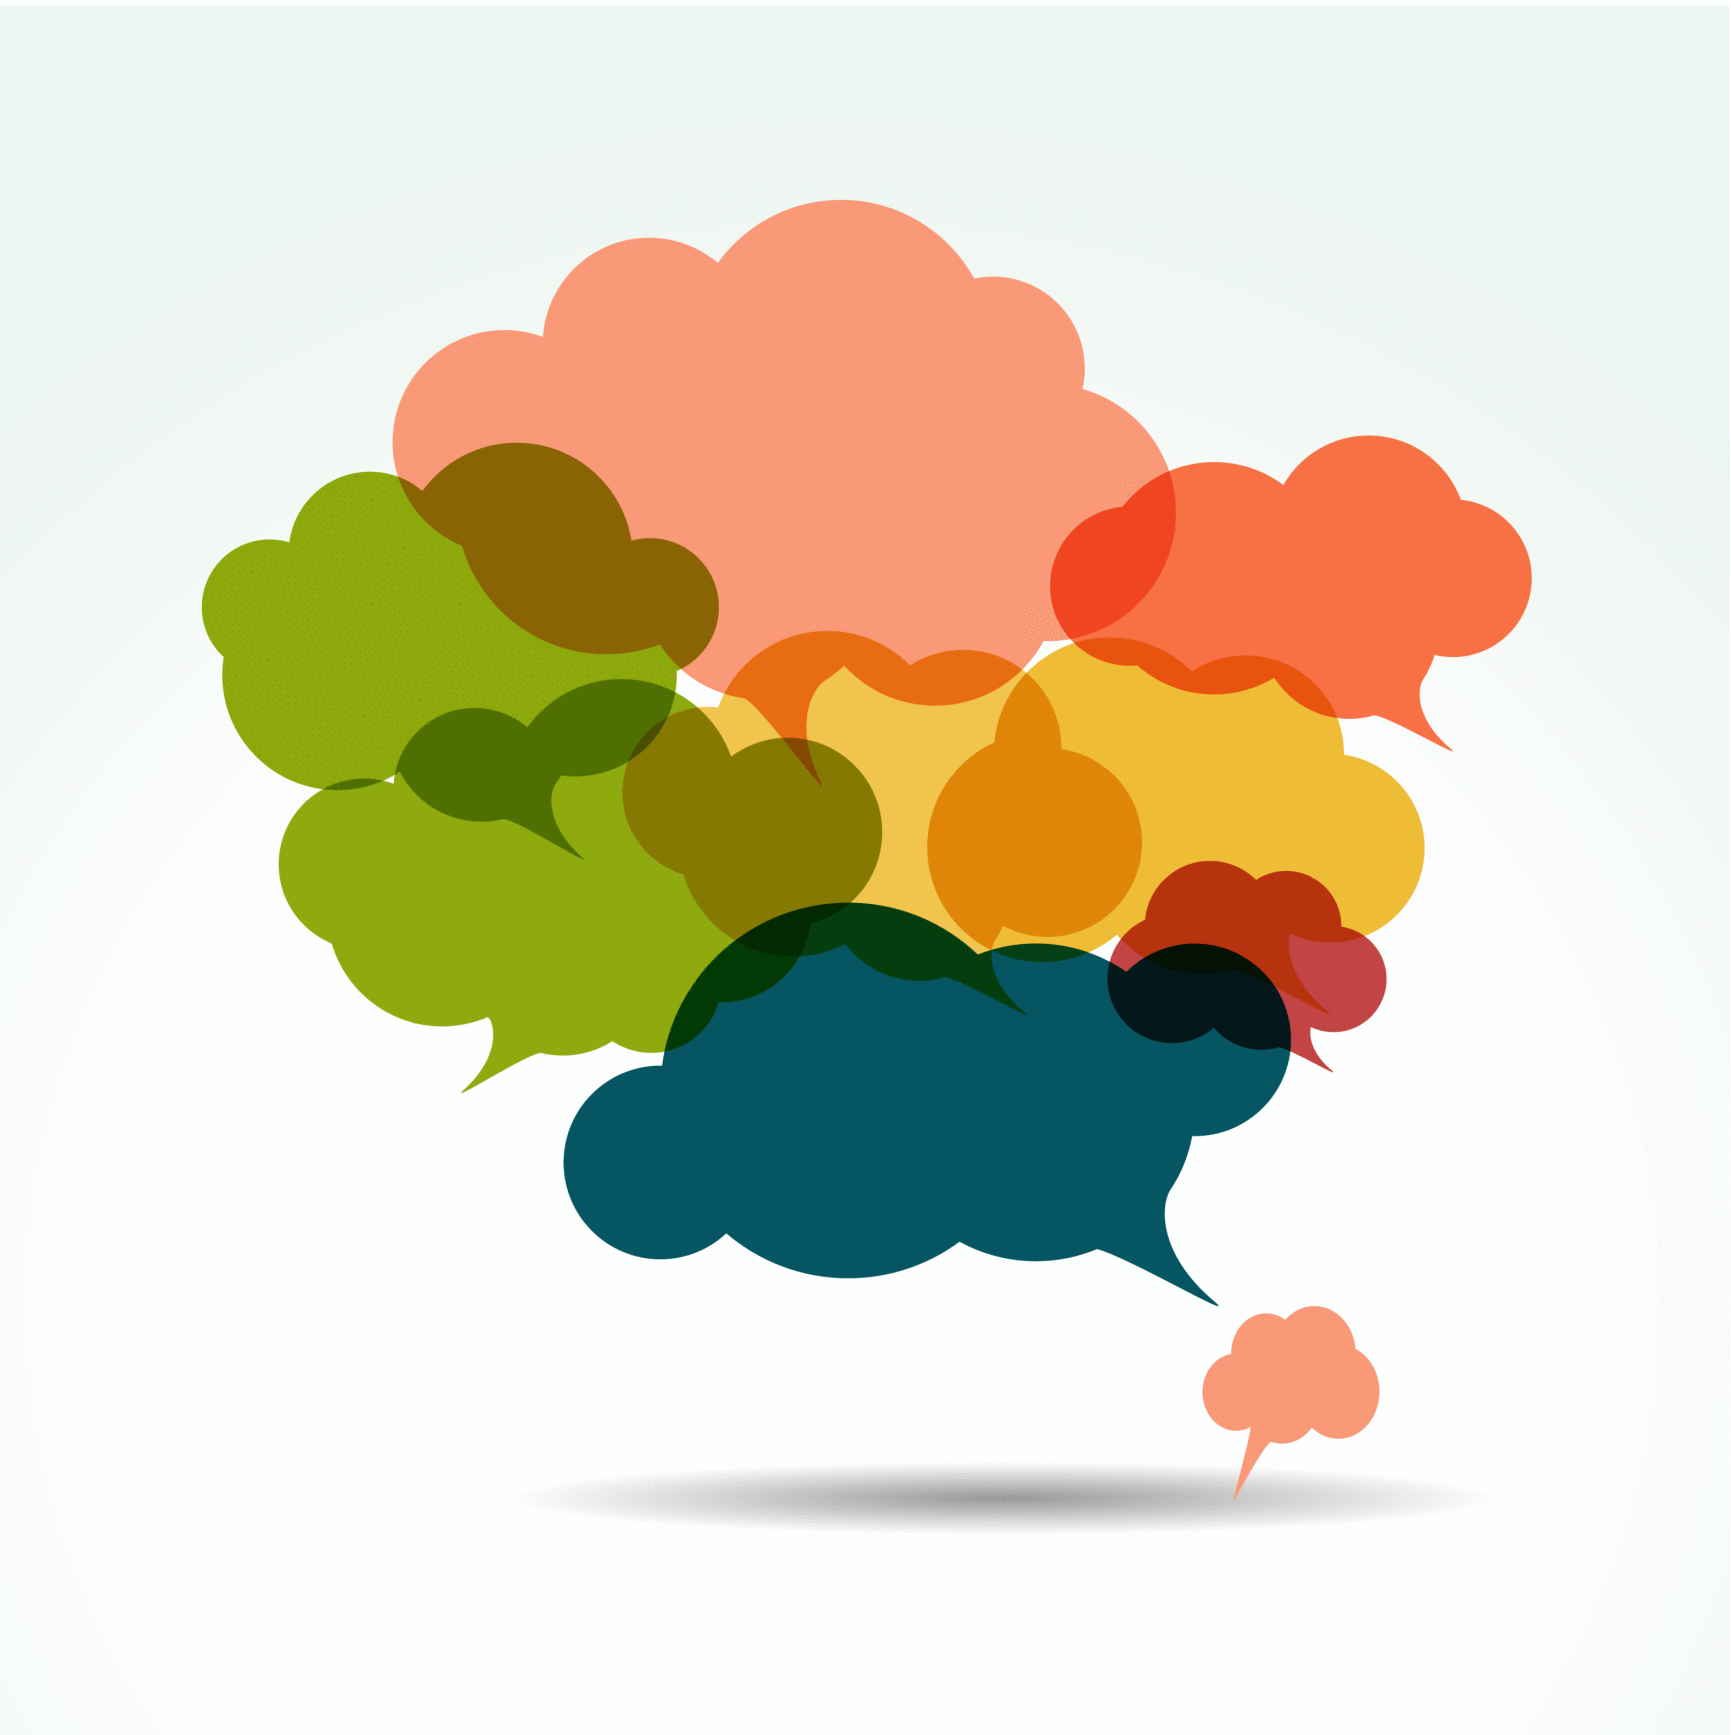 Mapas conceptuales como estrategias de aprendizaje